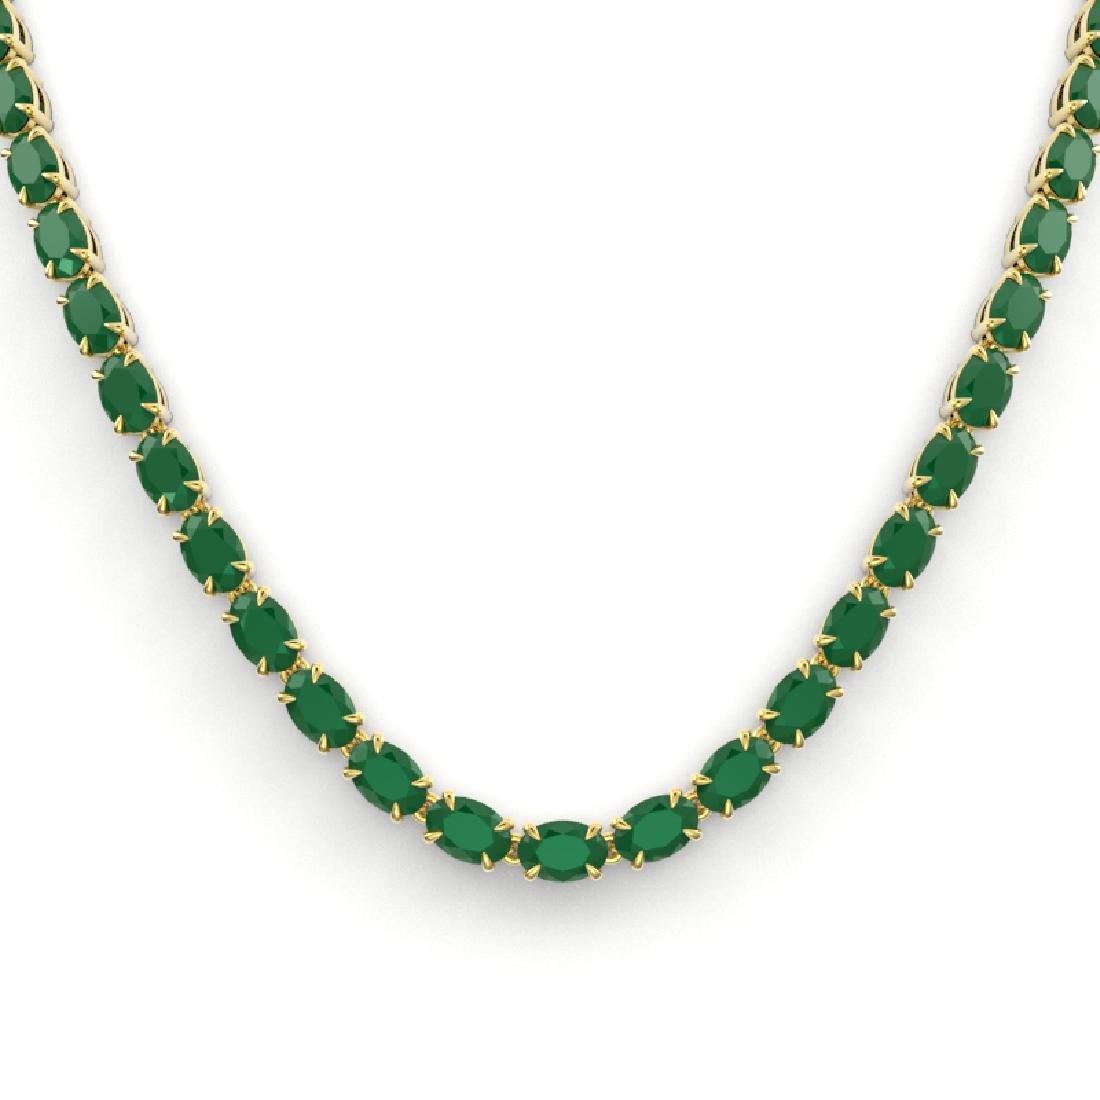 40 CTW Emerald Eternity Tennis Necklace 14K Yellow Gold - 2